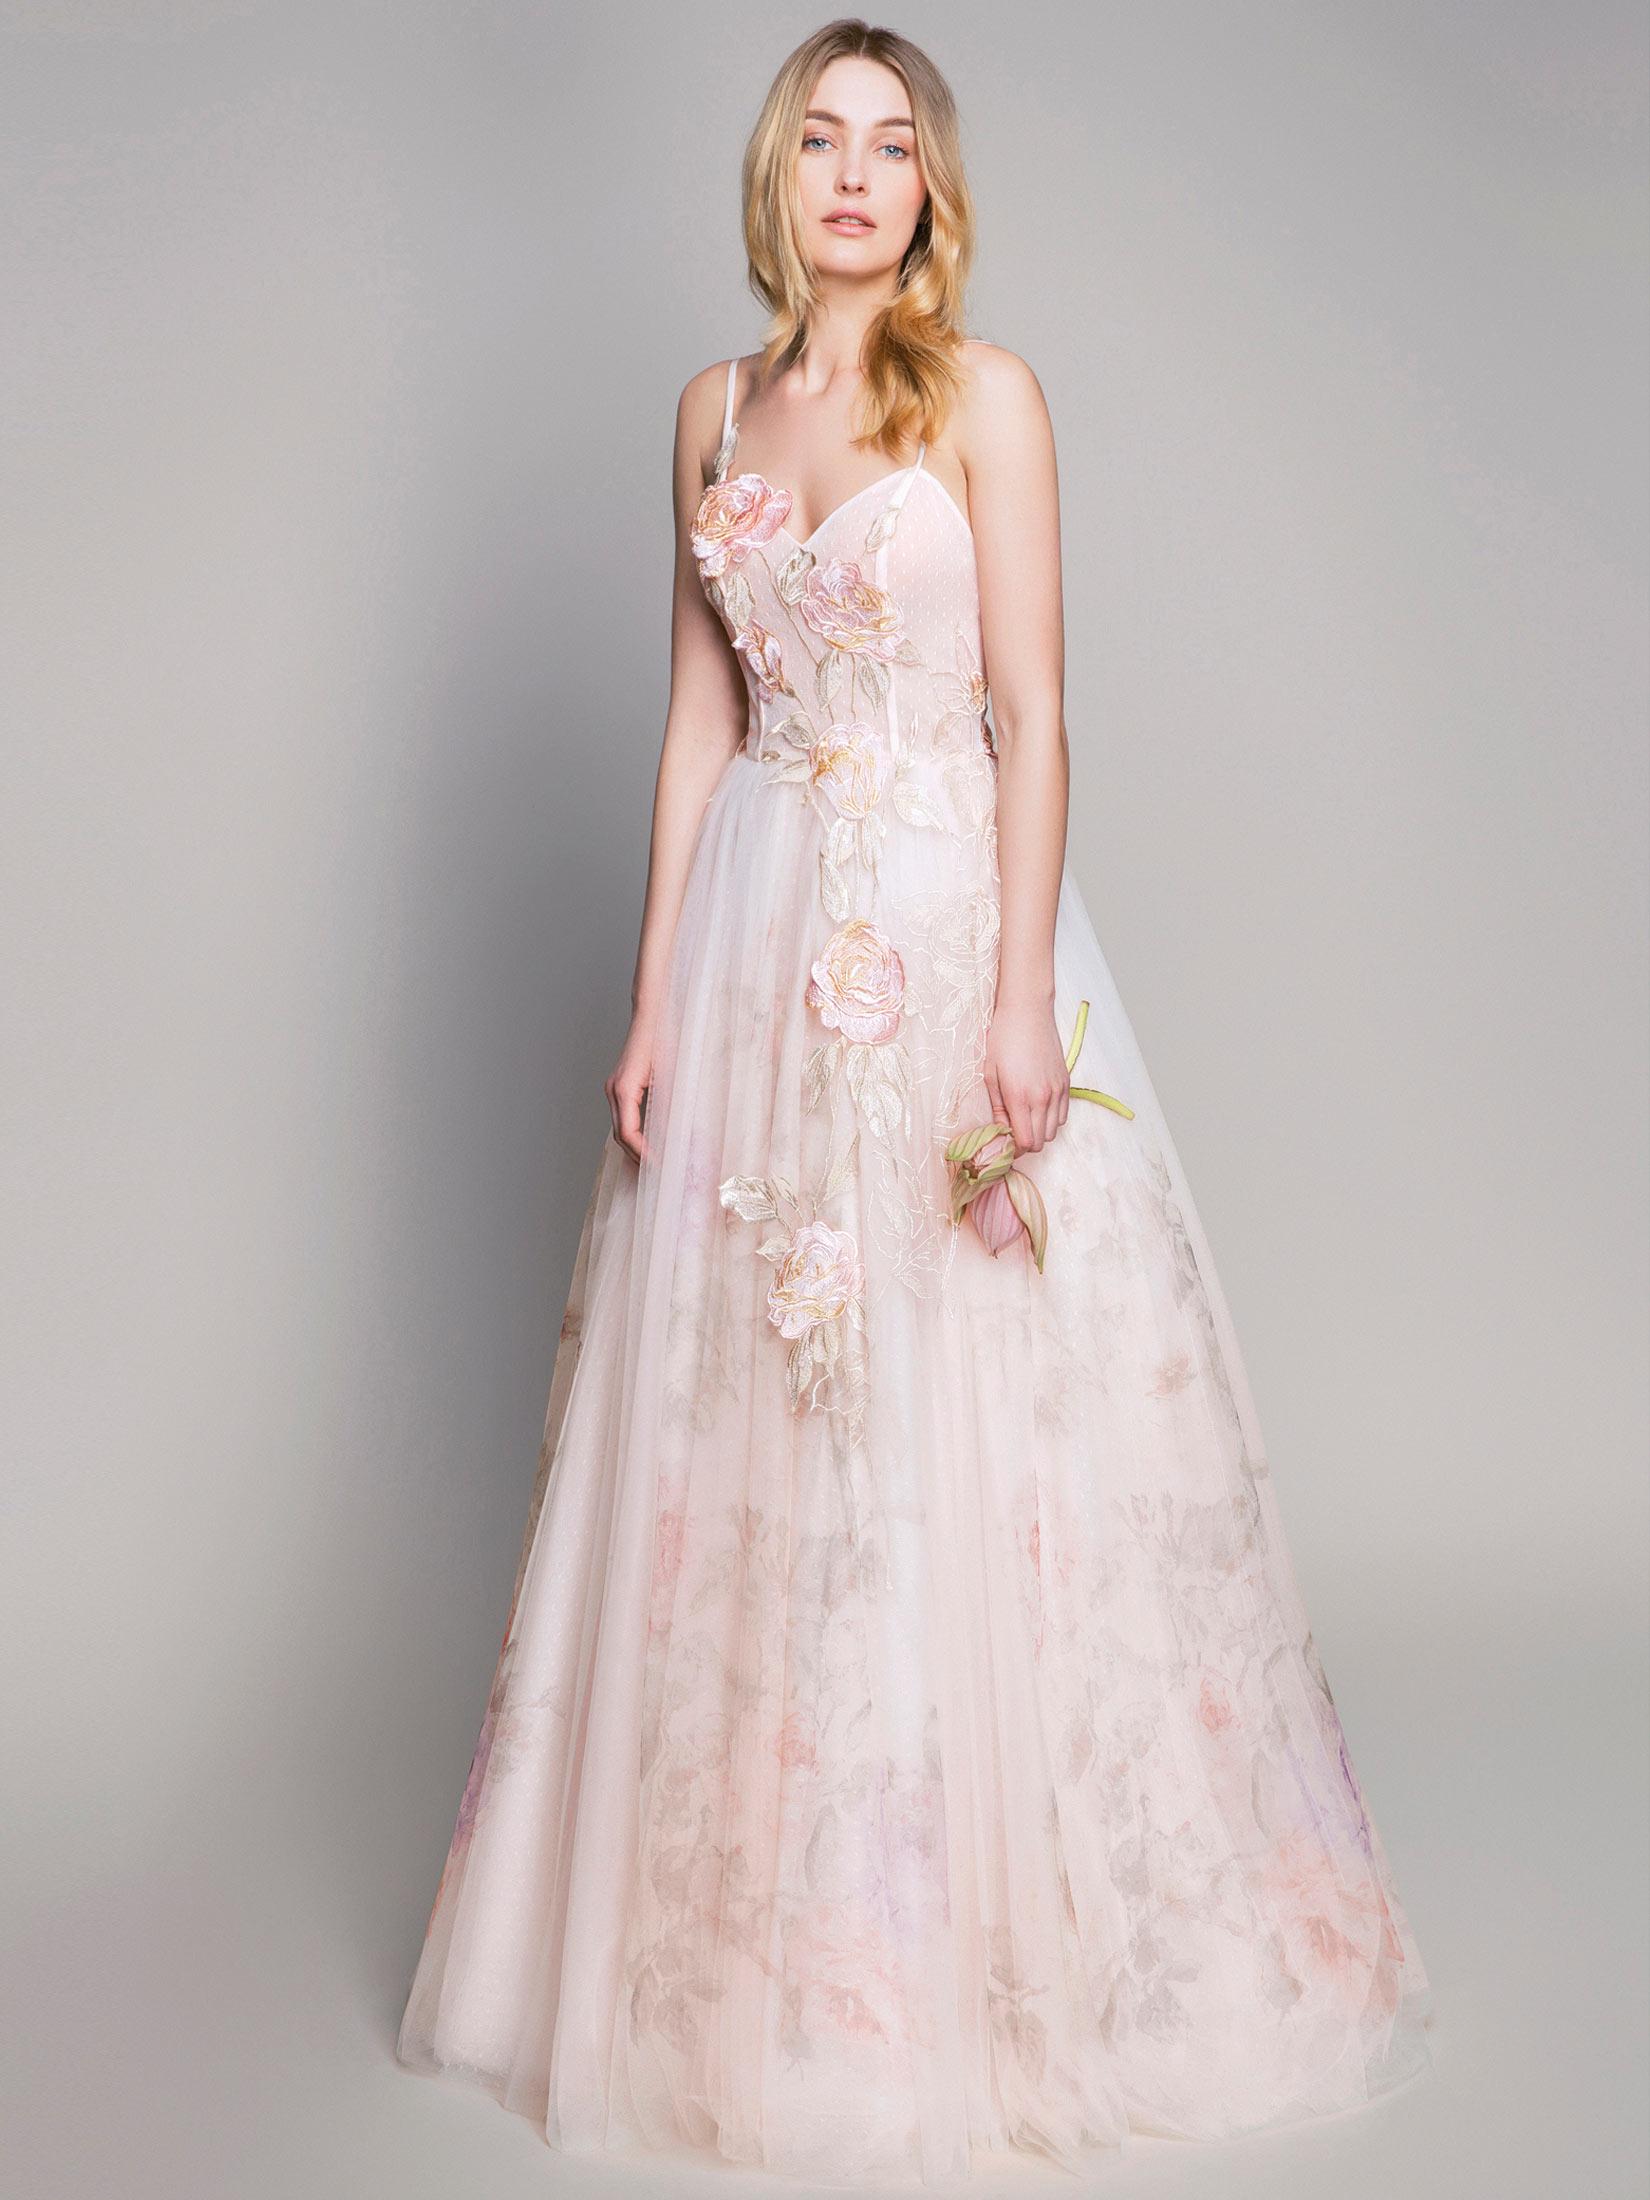 reputable site 64966 95799 Blumarine abiti da sposa